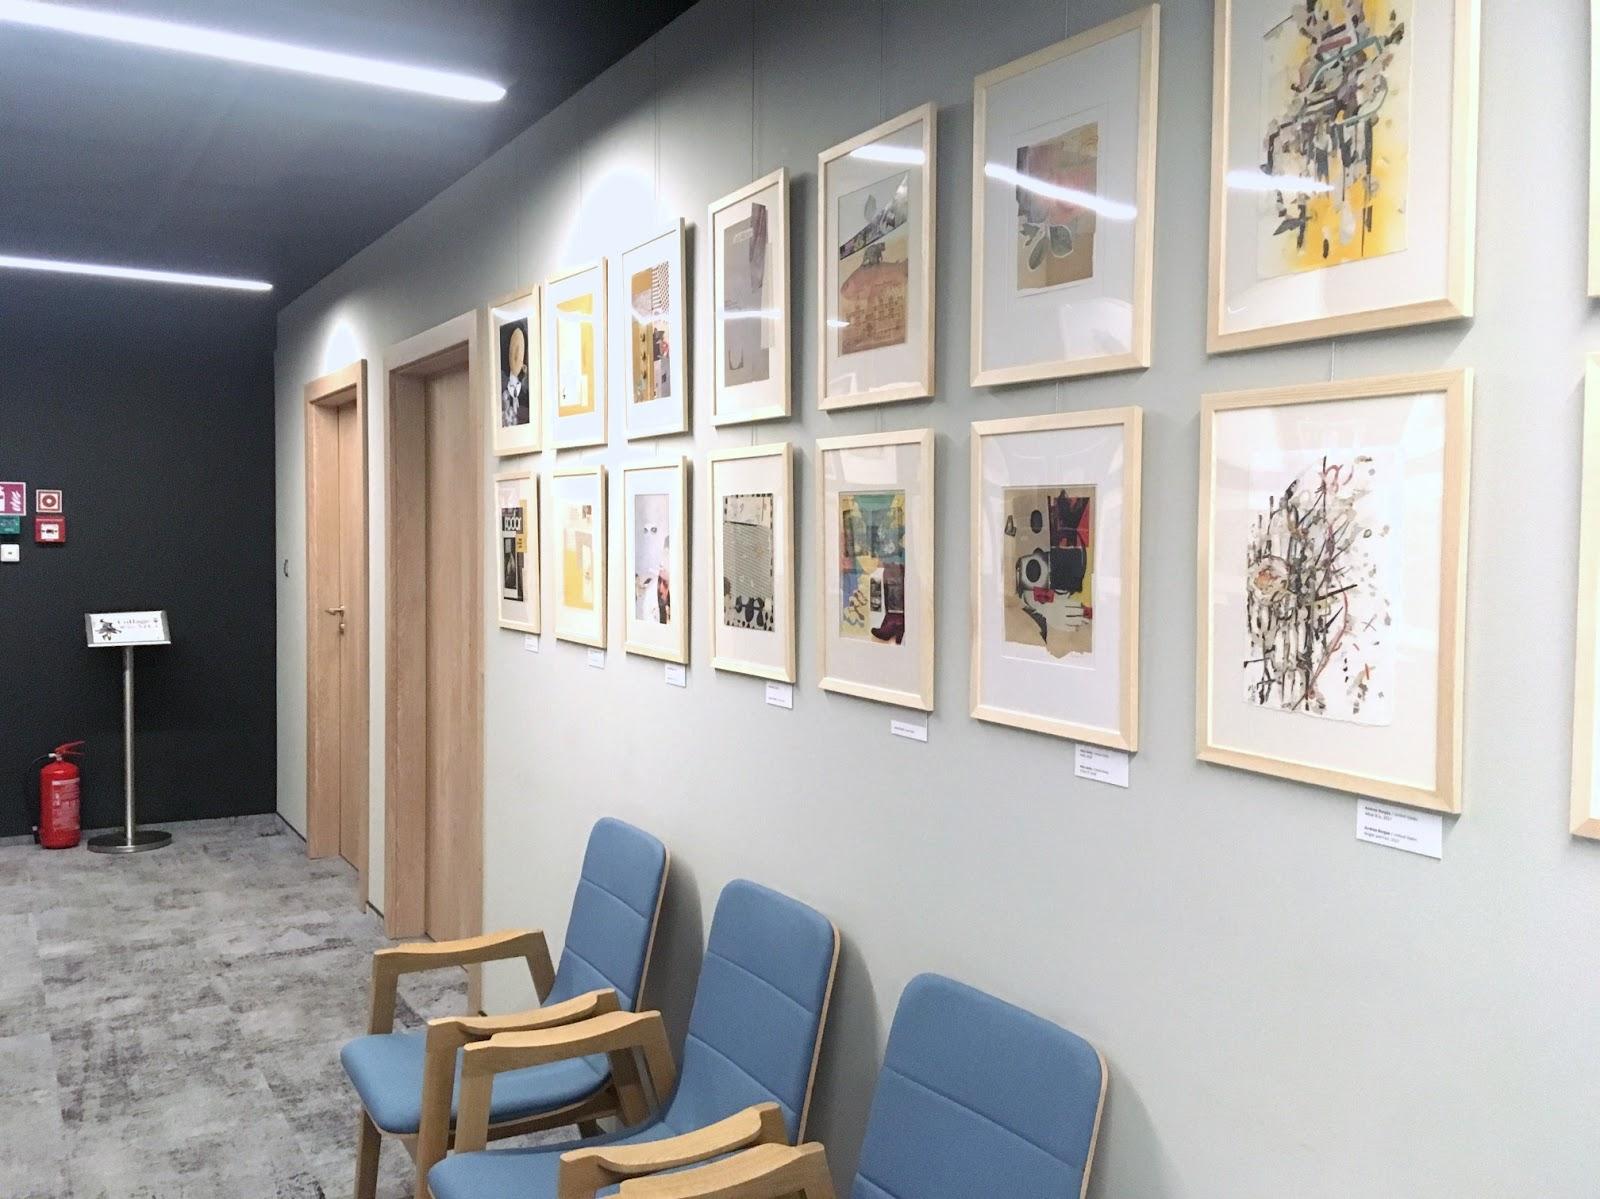 Galeria Retroavangarda